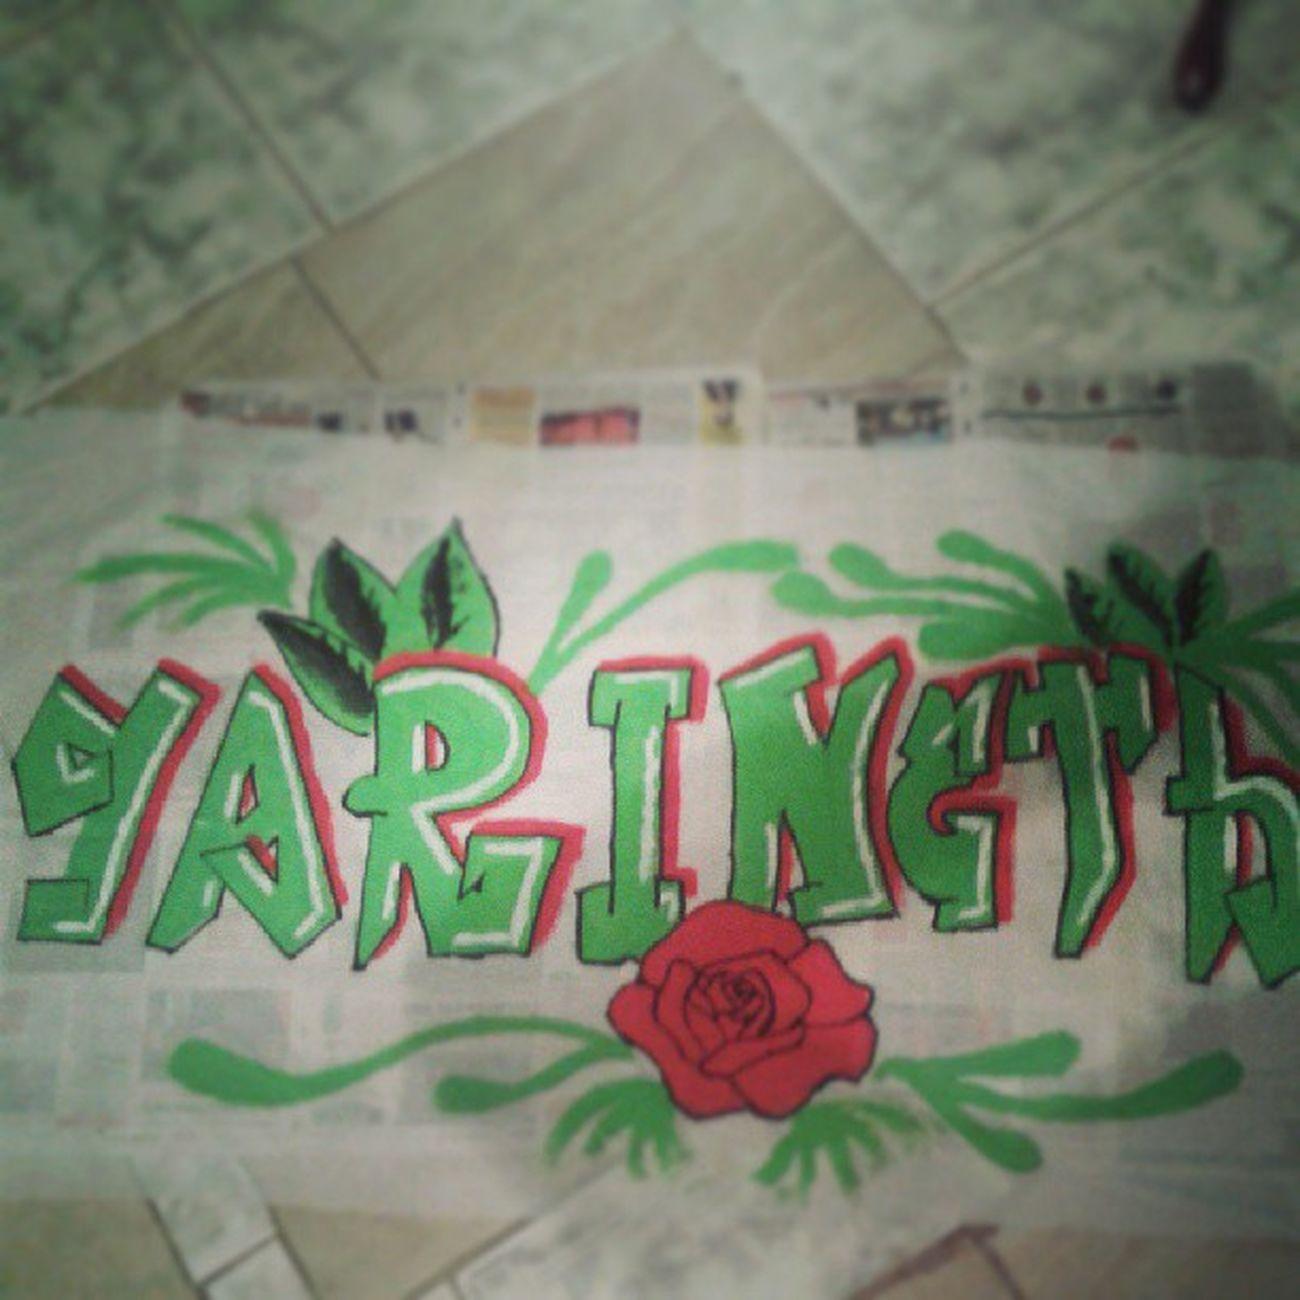 Bandera o creo q portada... Paint Yari Green Red rose flow like4like instamoment follow4follow follow follownow